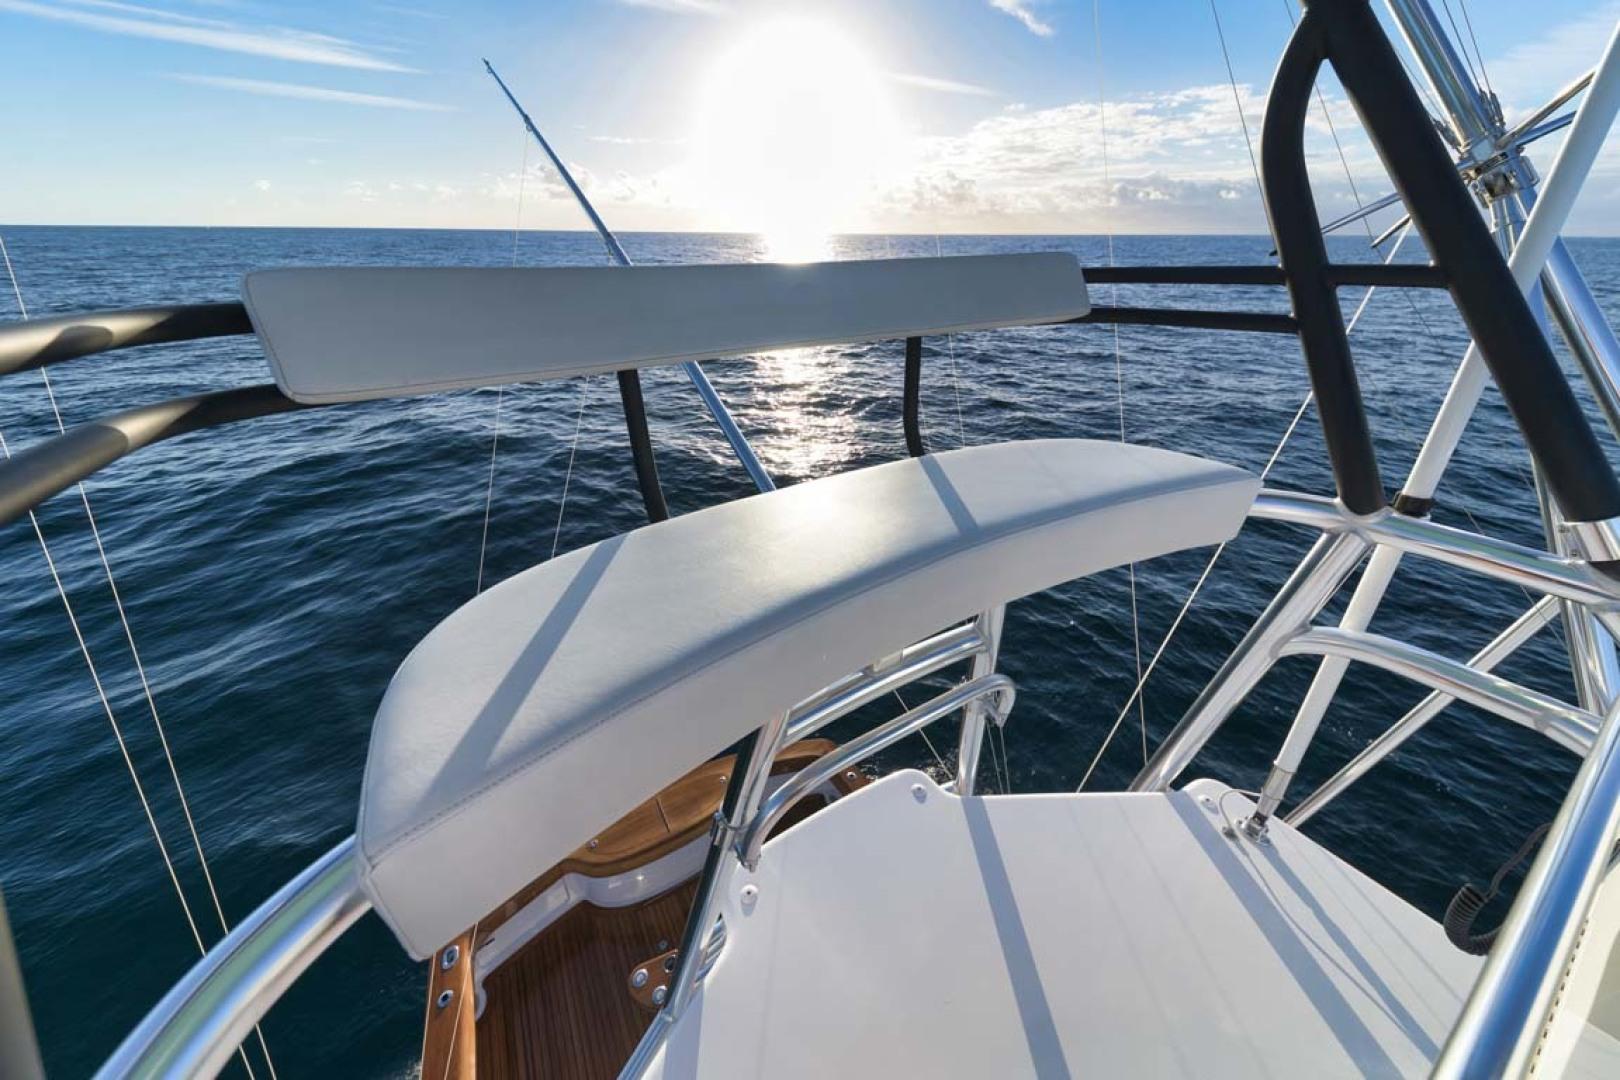 Winter Custom Yachts-46 Walkaround 2019-Family Circus Stuart-Florida-United States-Bench Seat-1563777 | Thumbnail